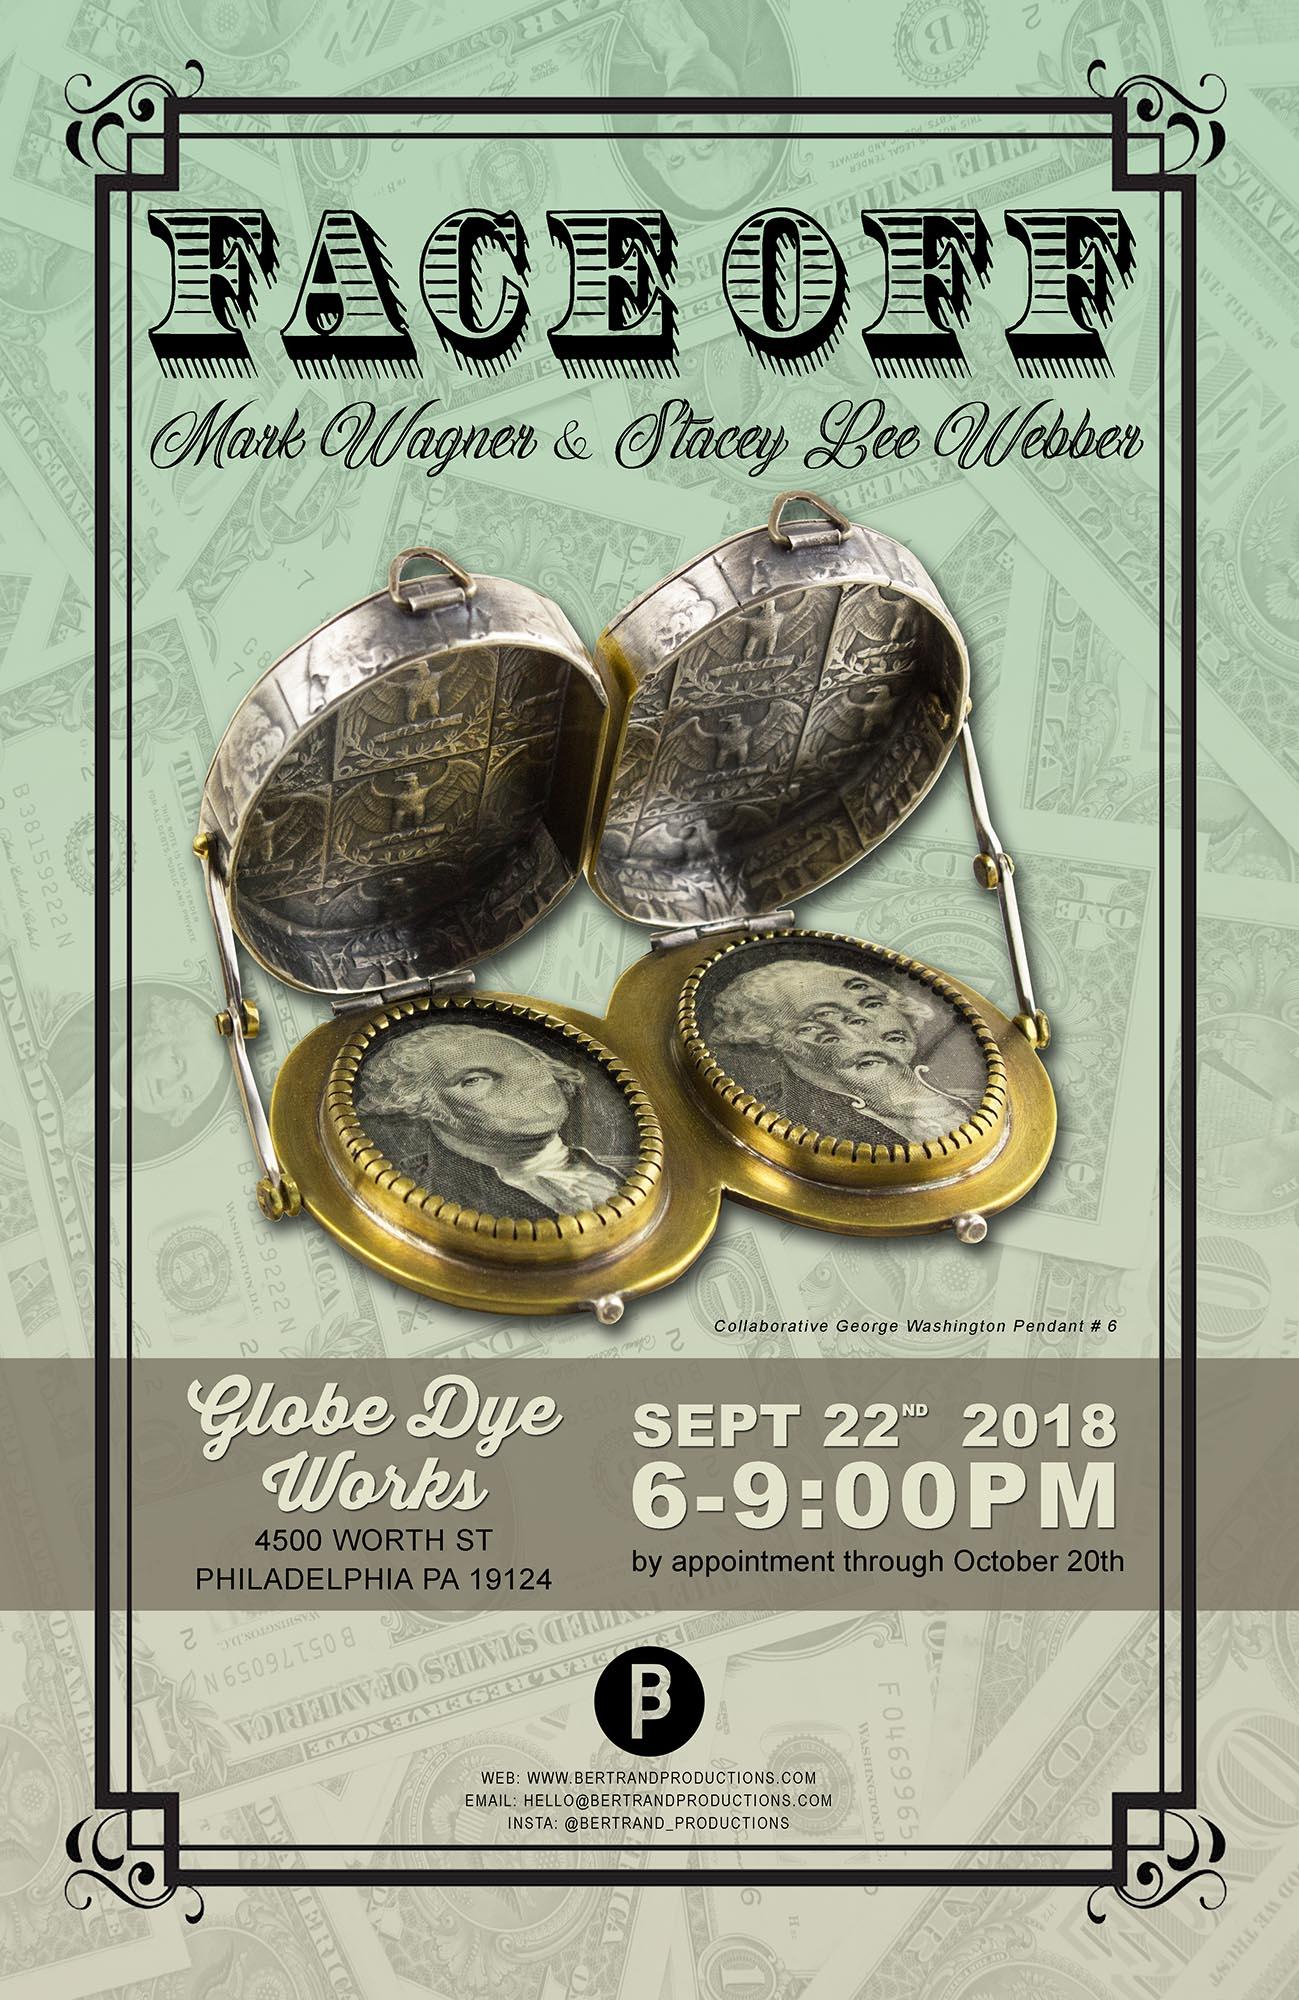 FACEOFF - Artists: Mark Wagner & Stacey Lee WebberOpening Party - Saturday Sept 22, 2018 6-9pmShow Open Sept 22 - Oct 20, 2018Globe Dye Works BuildingPhiladelphia PA USA